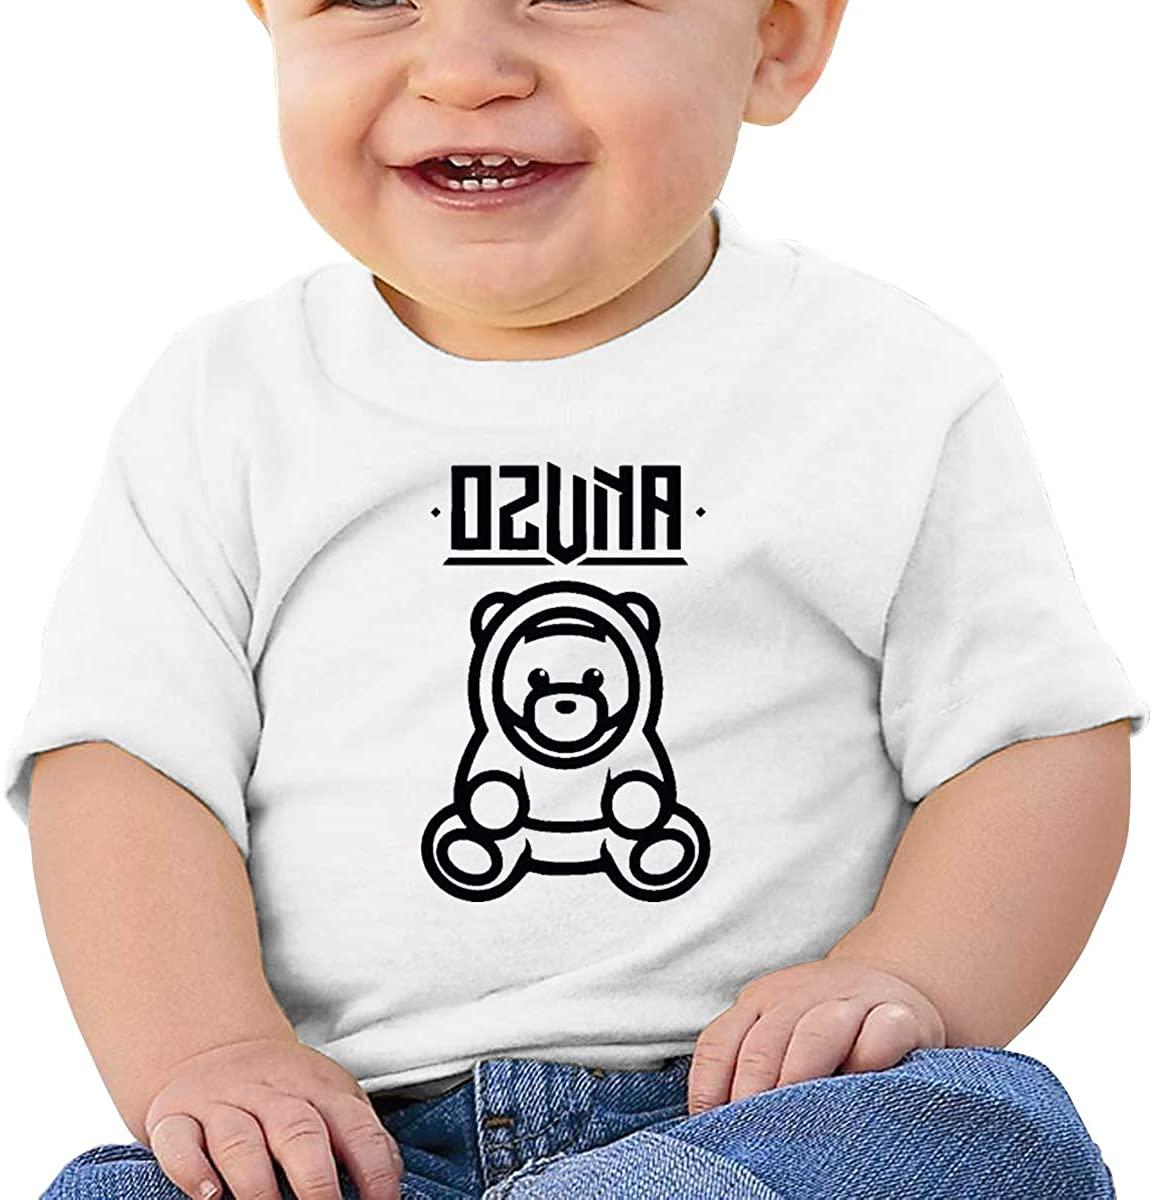 6-24 Months Boy and Girl Baby Short Sleeve T-Shirt Ozuna Bear Logo Original Minimalist Style White